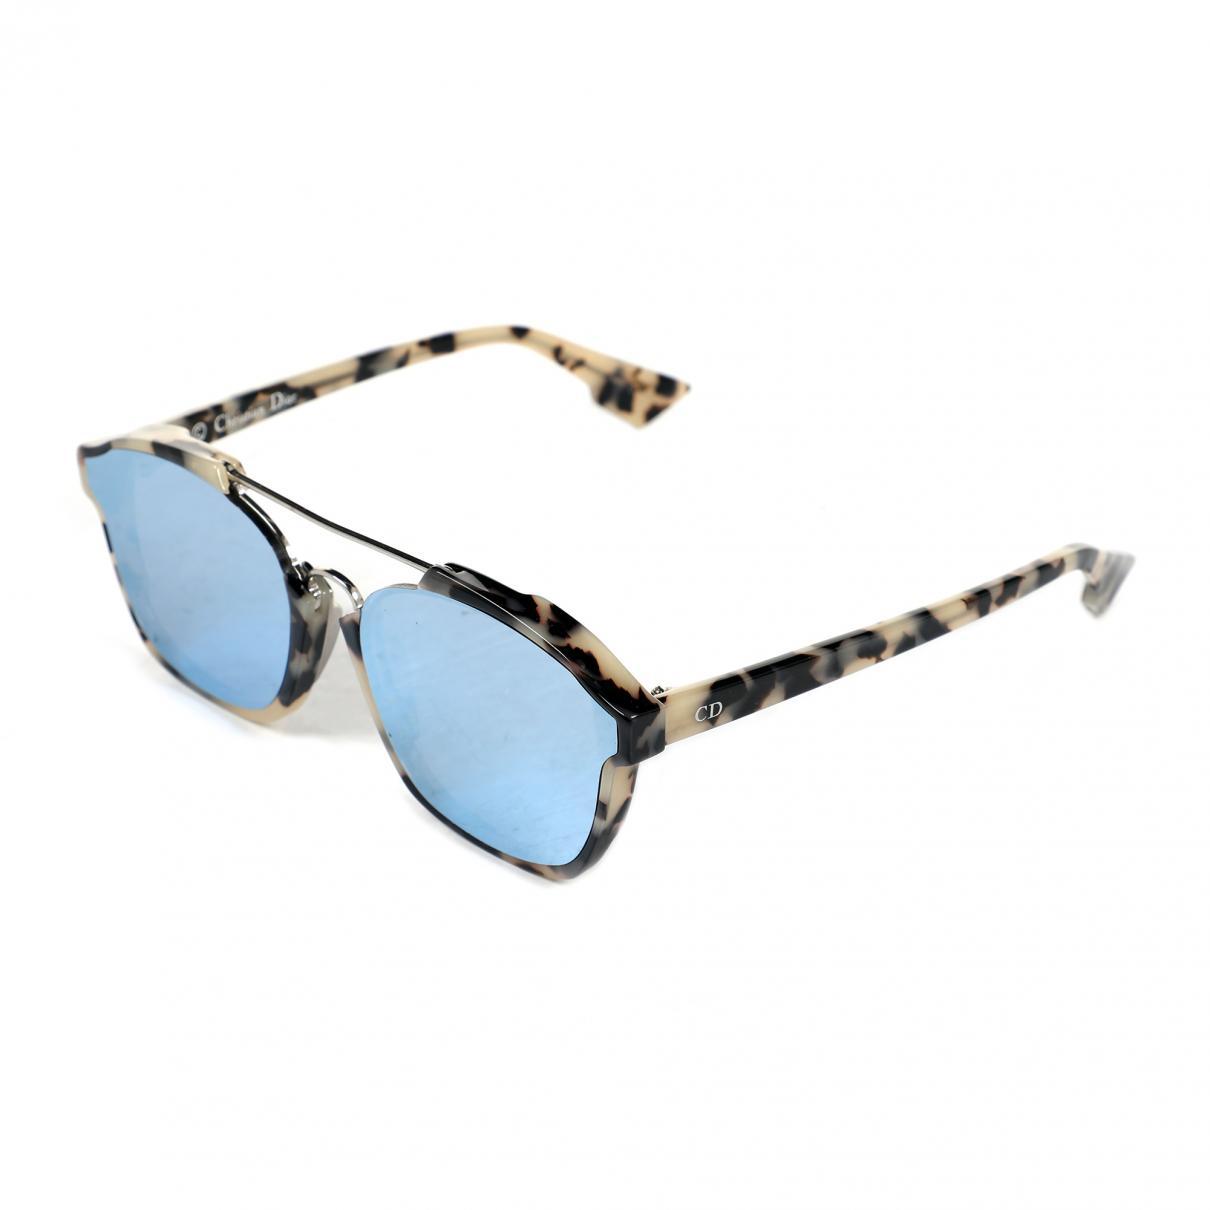 6ccadd7fda8 Lyst - Dior Sunglasses